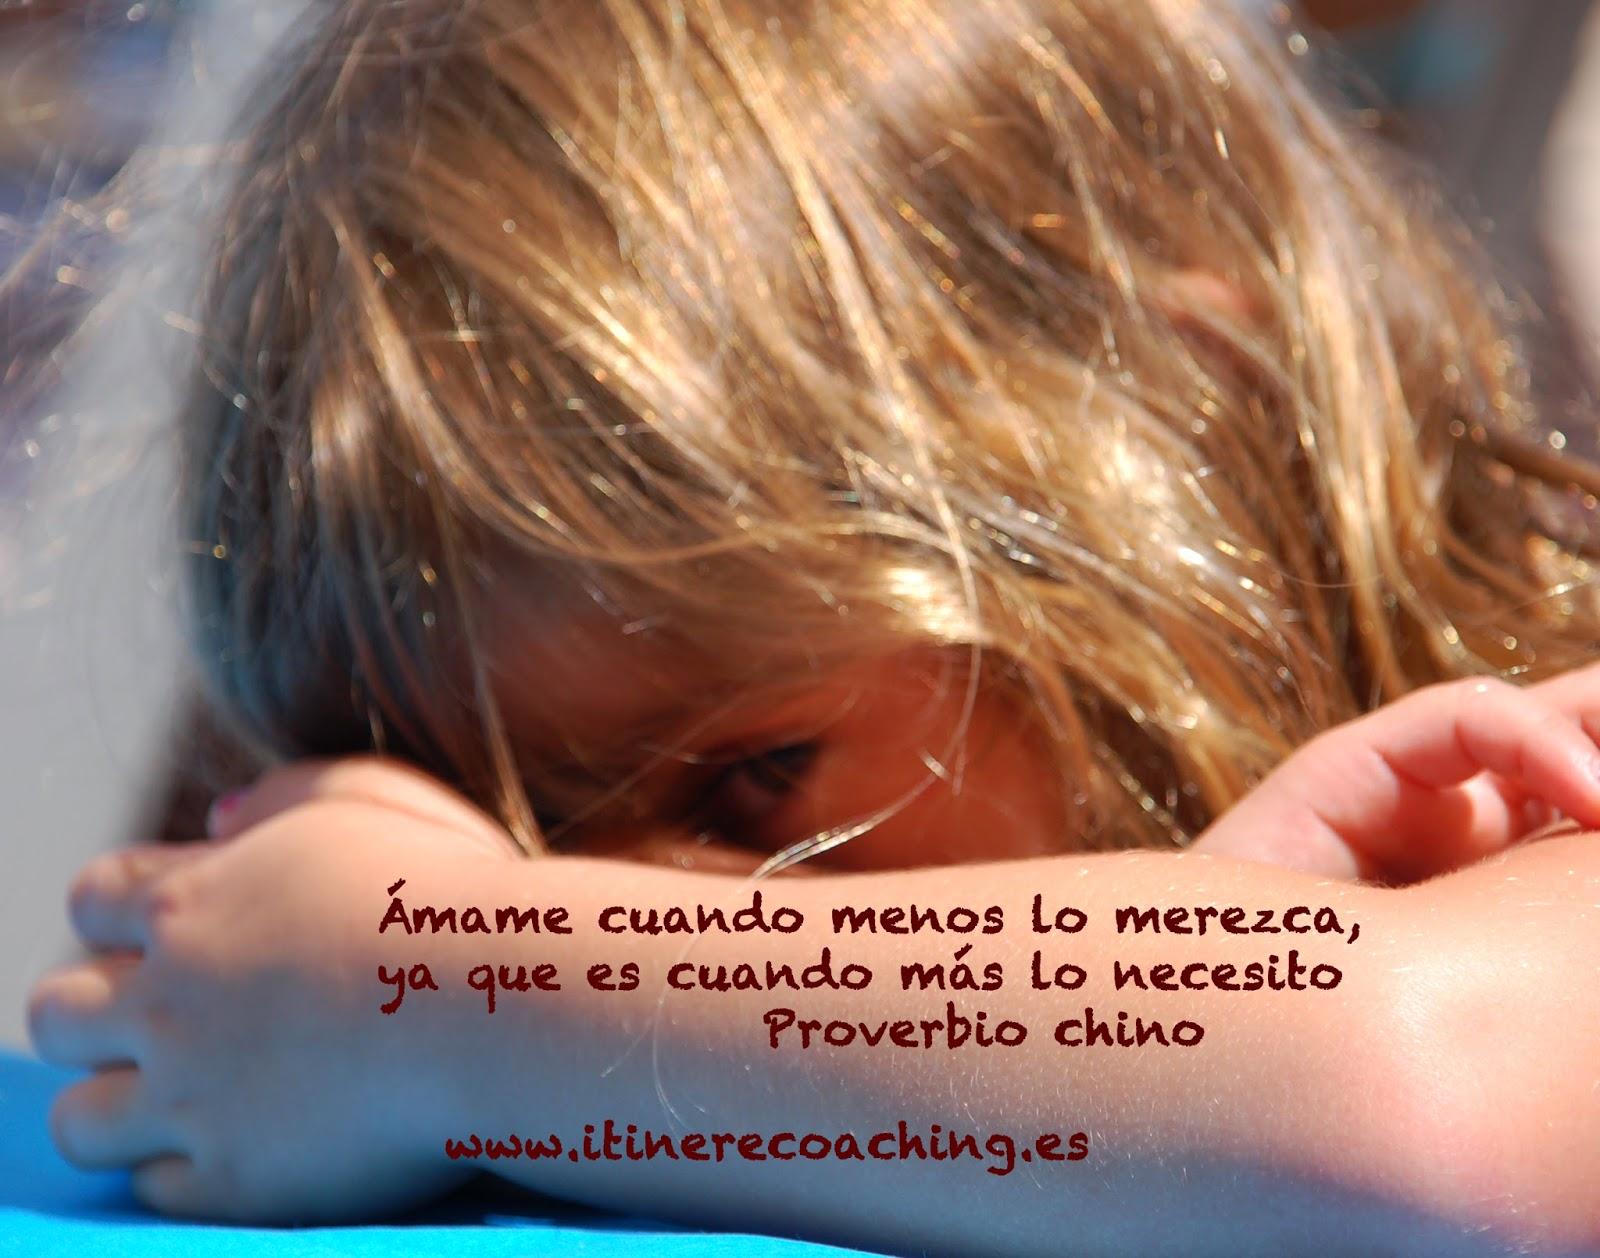 http://leyautonoma.blogspot.com